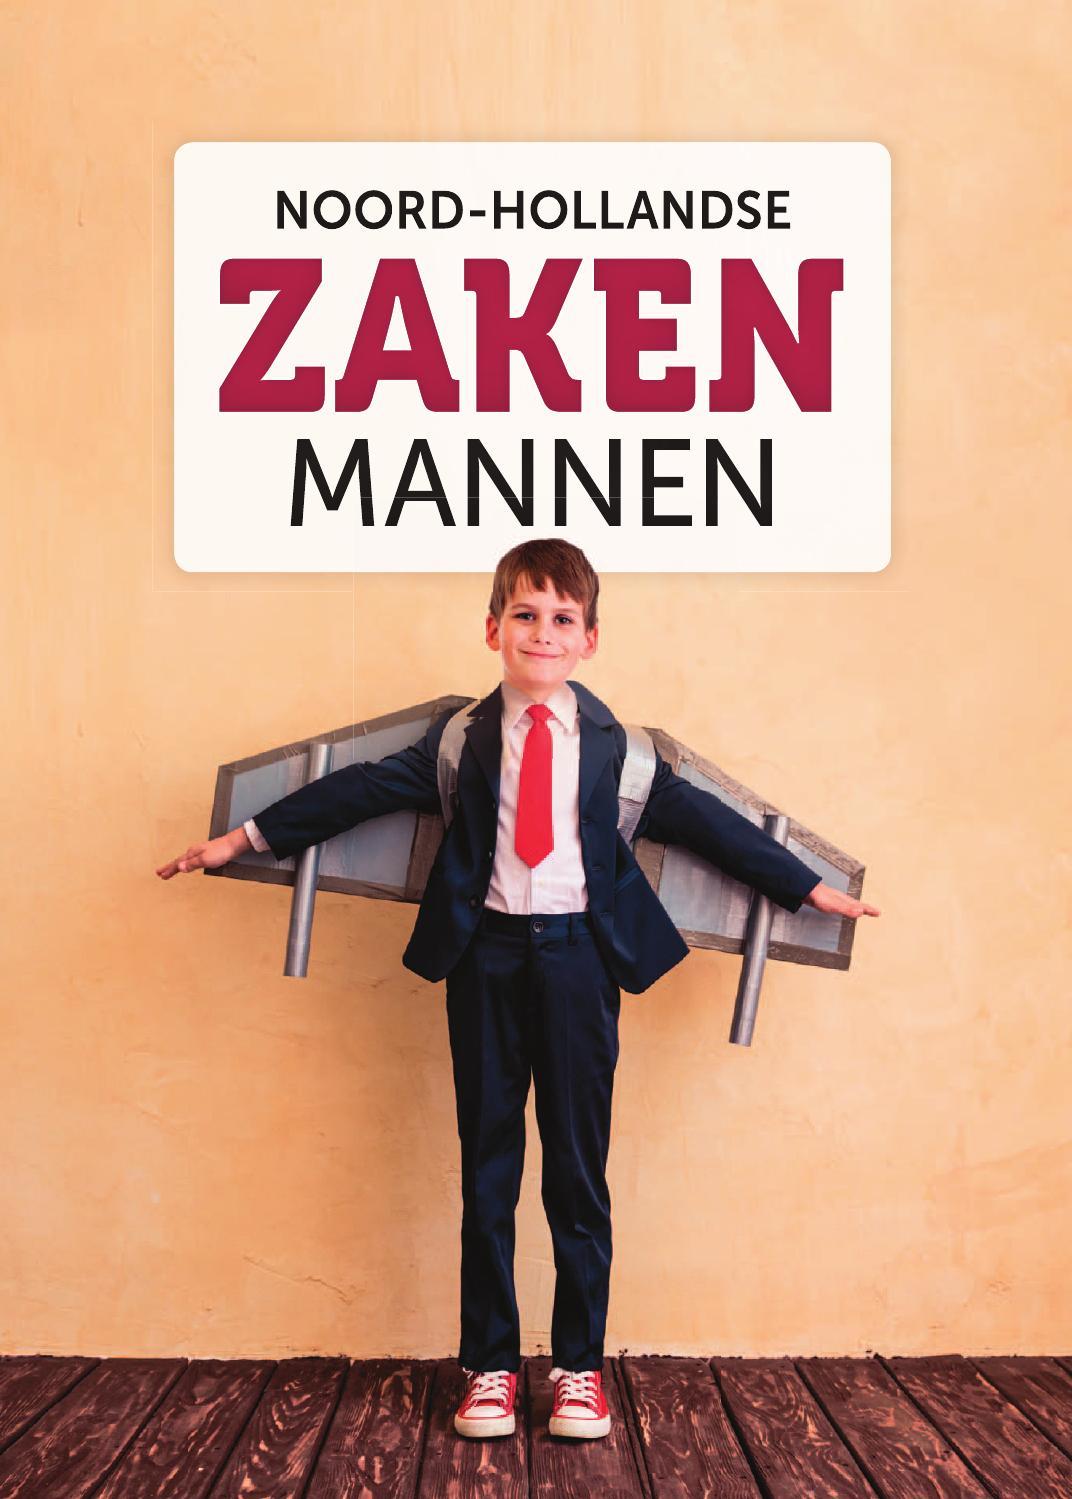 Noord Hollandse Zakenmannen 2016 2017 By Rodi Media Issuu